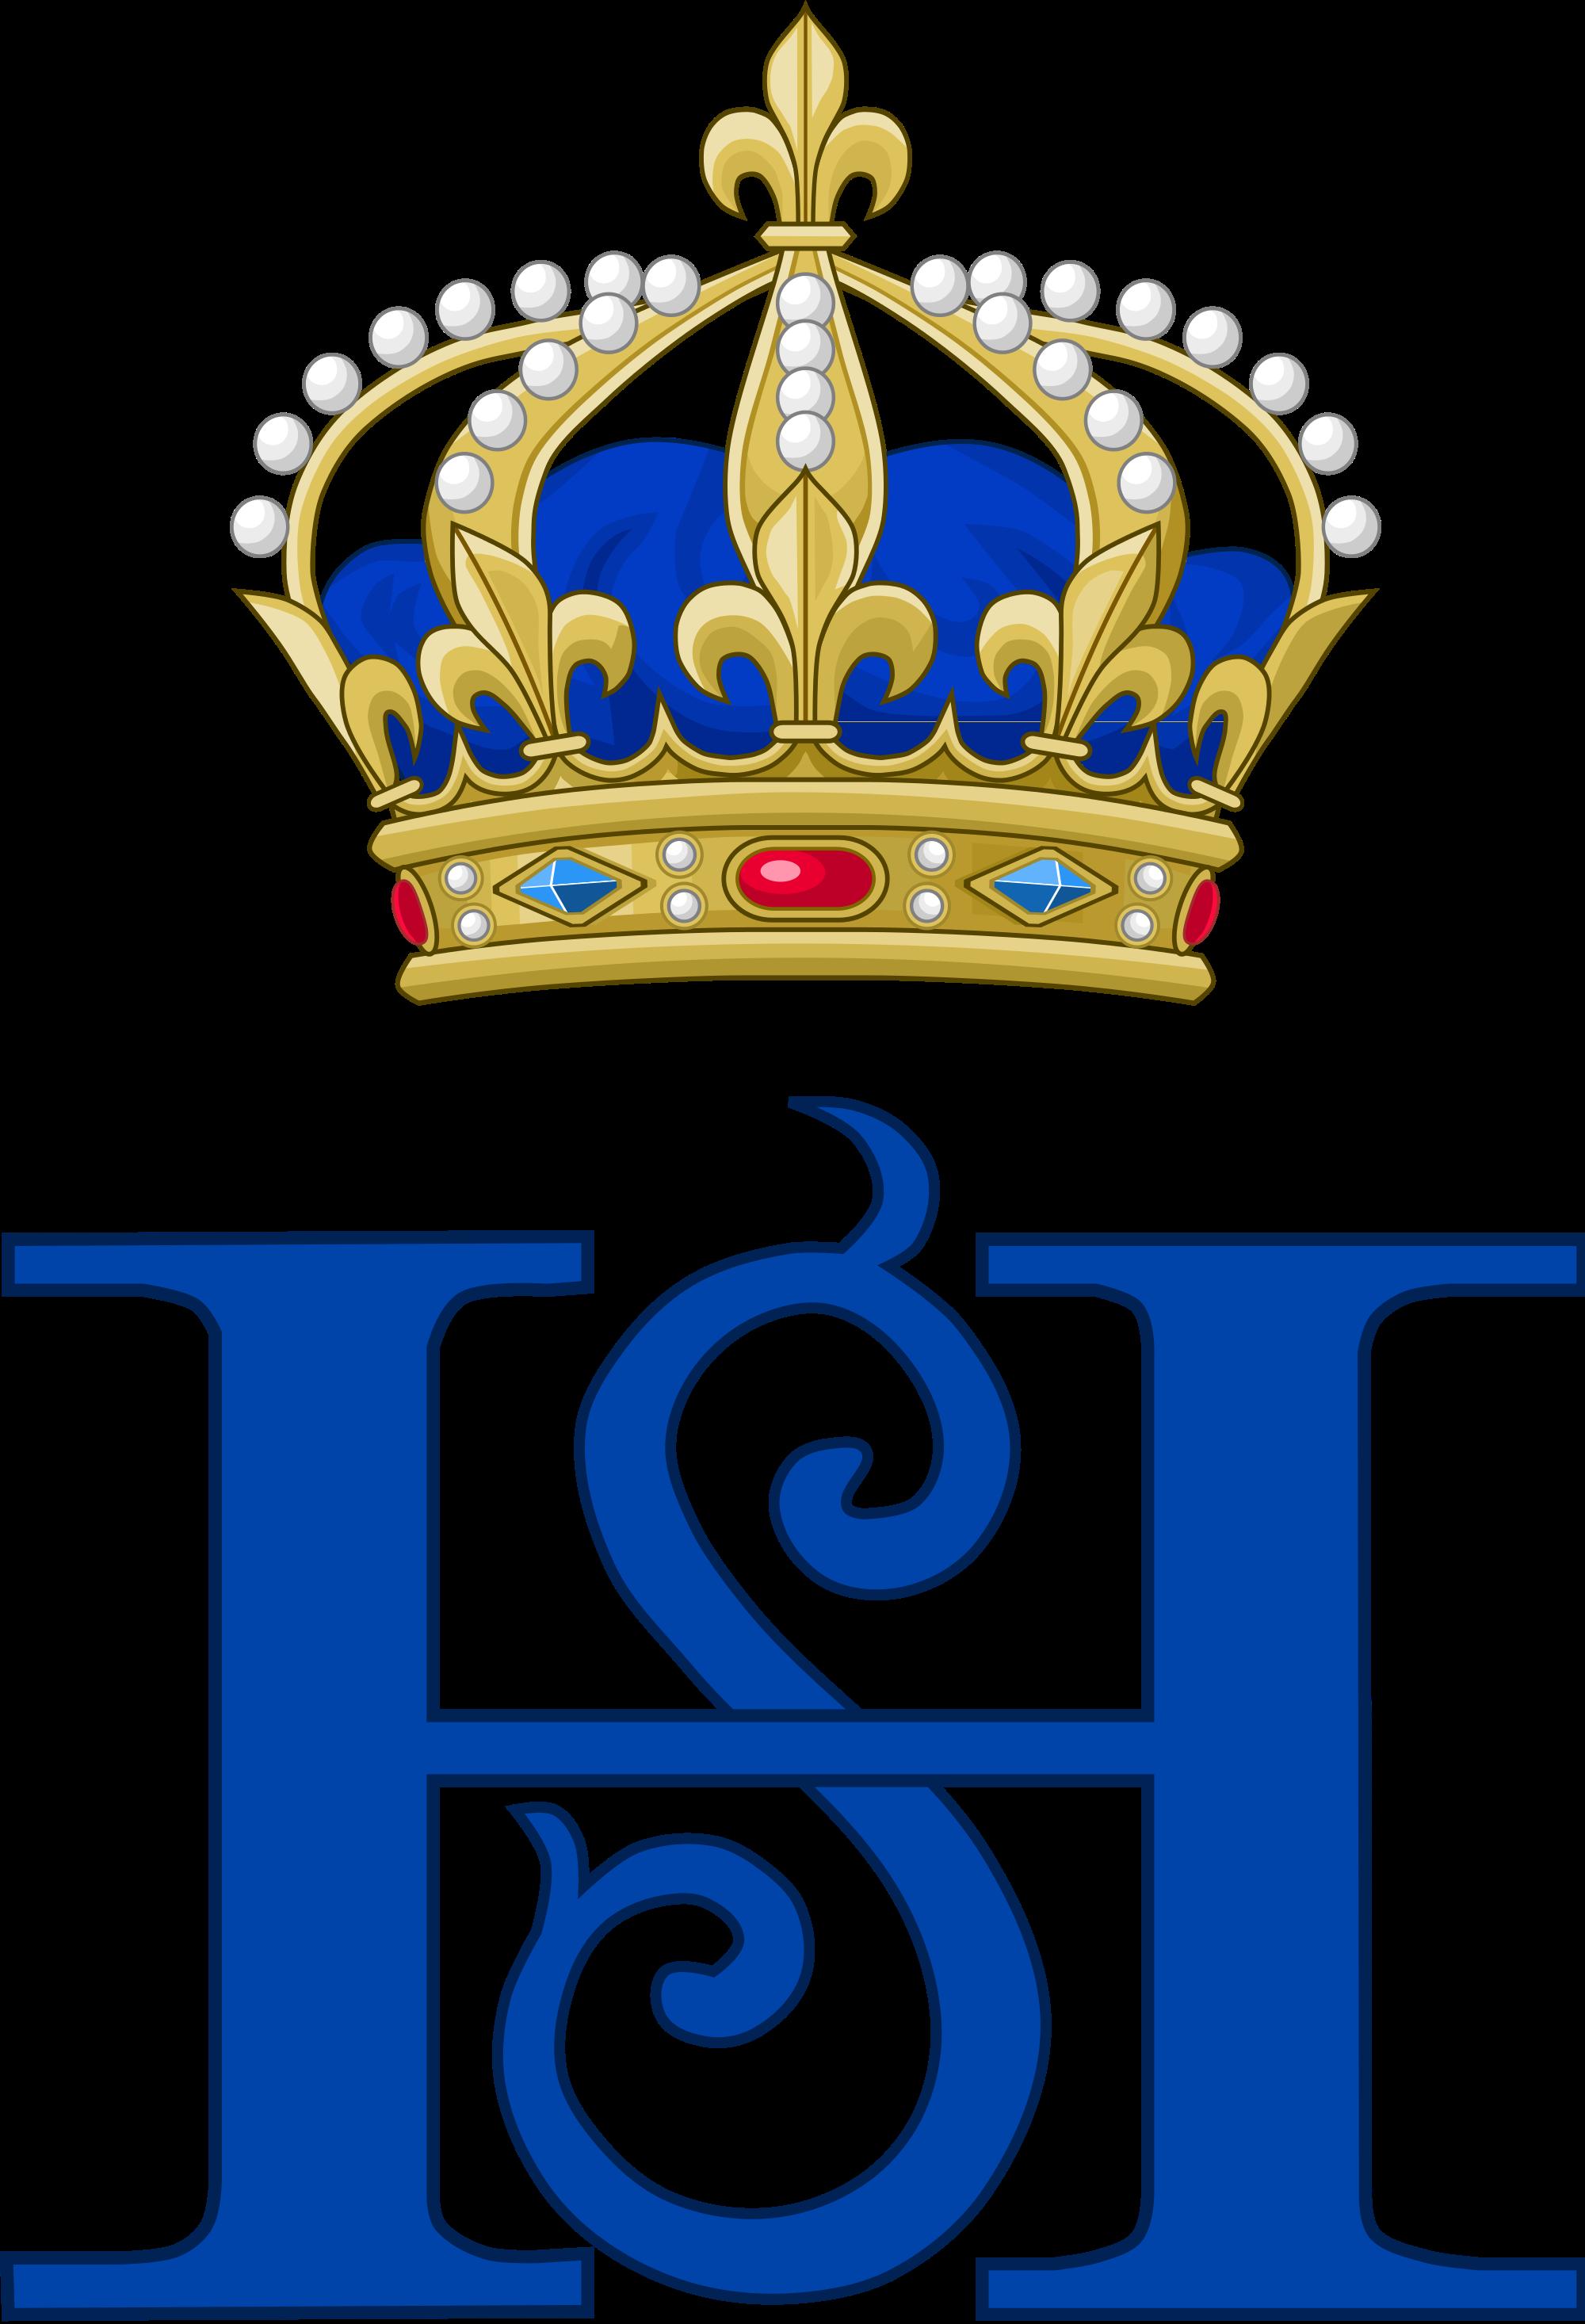 King henri iv of france royal monograms pinterest king henri iv of france biocorpaavc Gallery